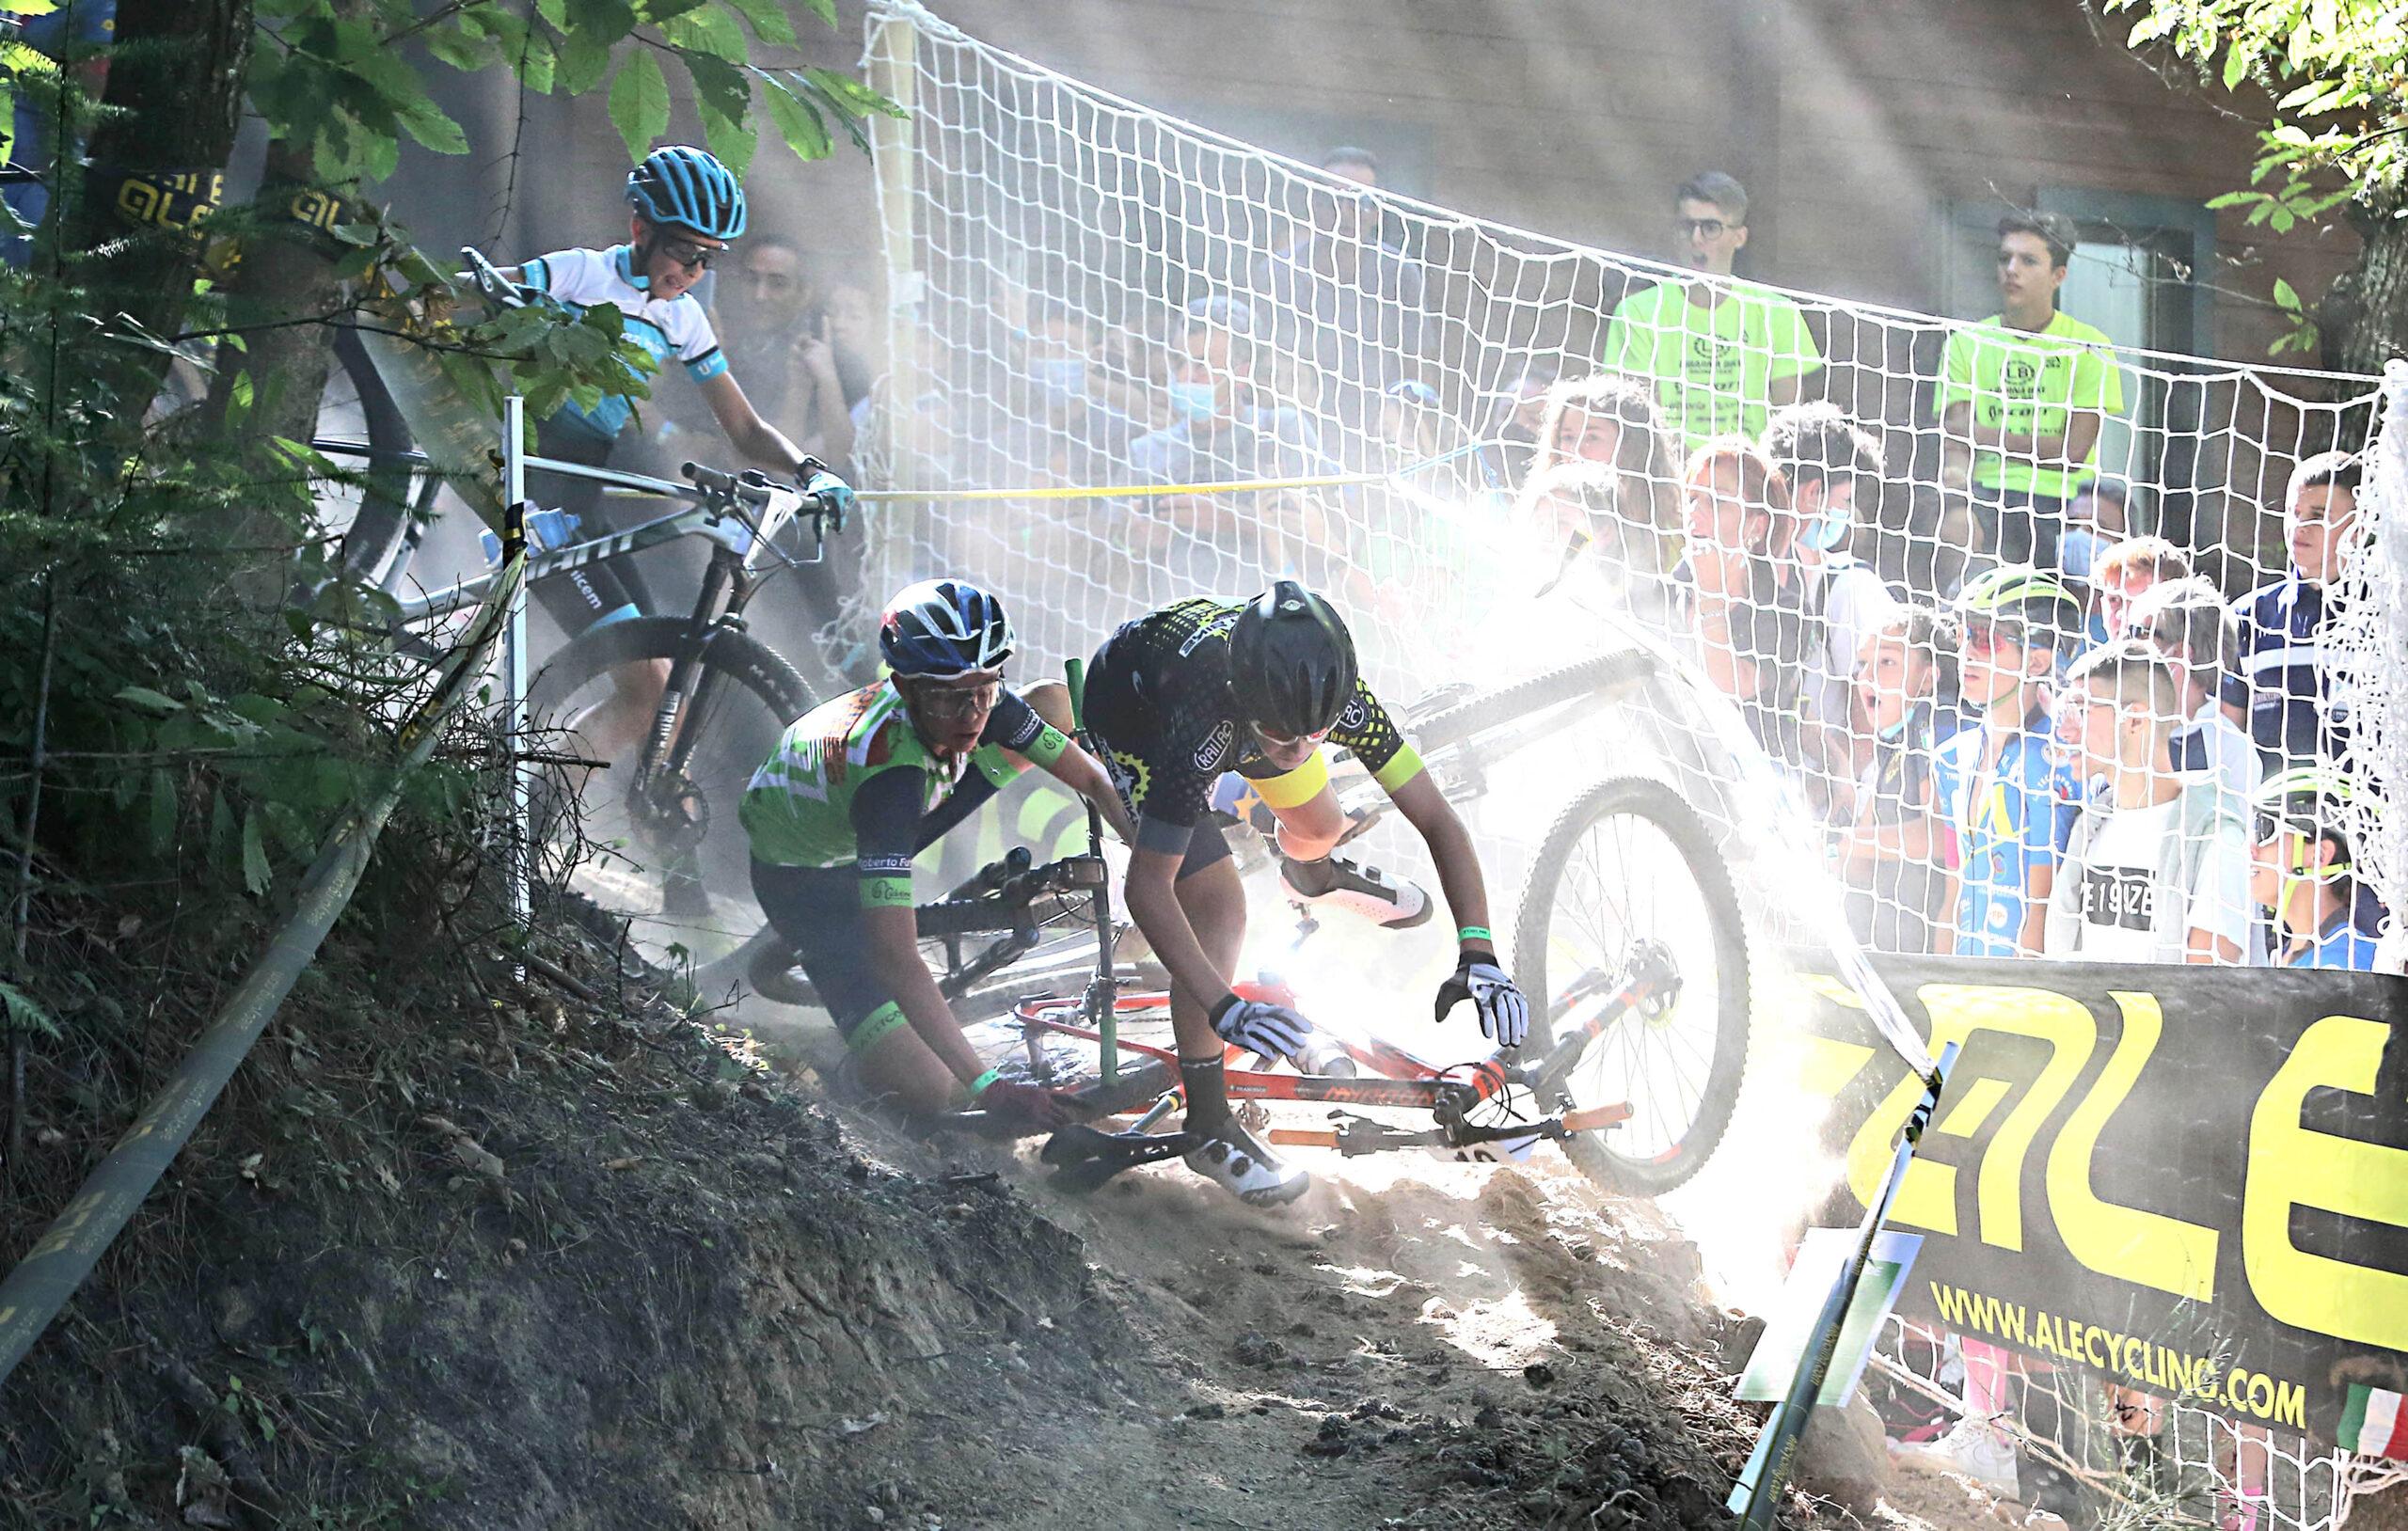 Campionati Italiani Mtb Giovanili 2020